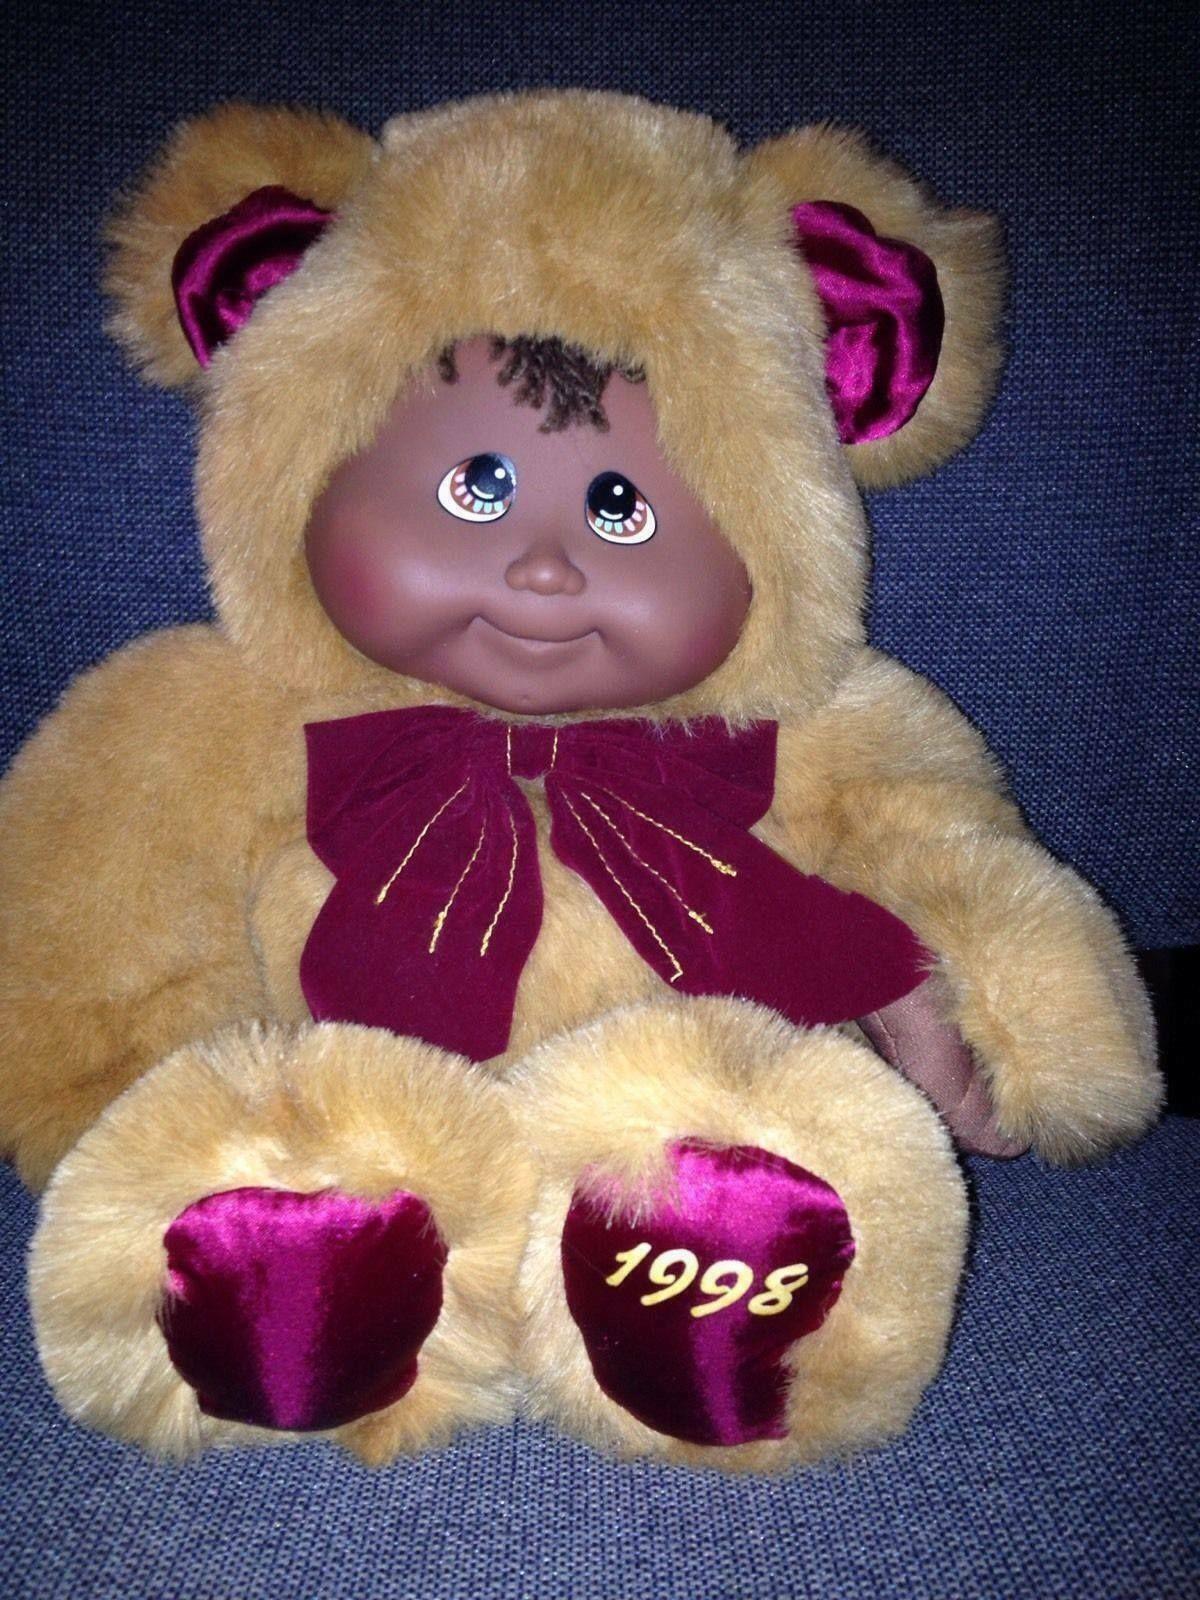 1998 Special Friend Kuddle Love Kid Stuffed Baby Face Doll Cabbage Patch Dolls Special Friend Dolls [ 1600 x 1200 Pixel ]